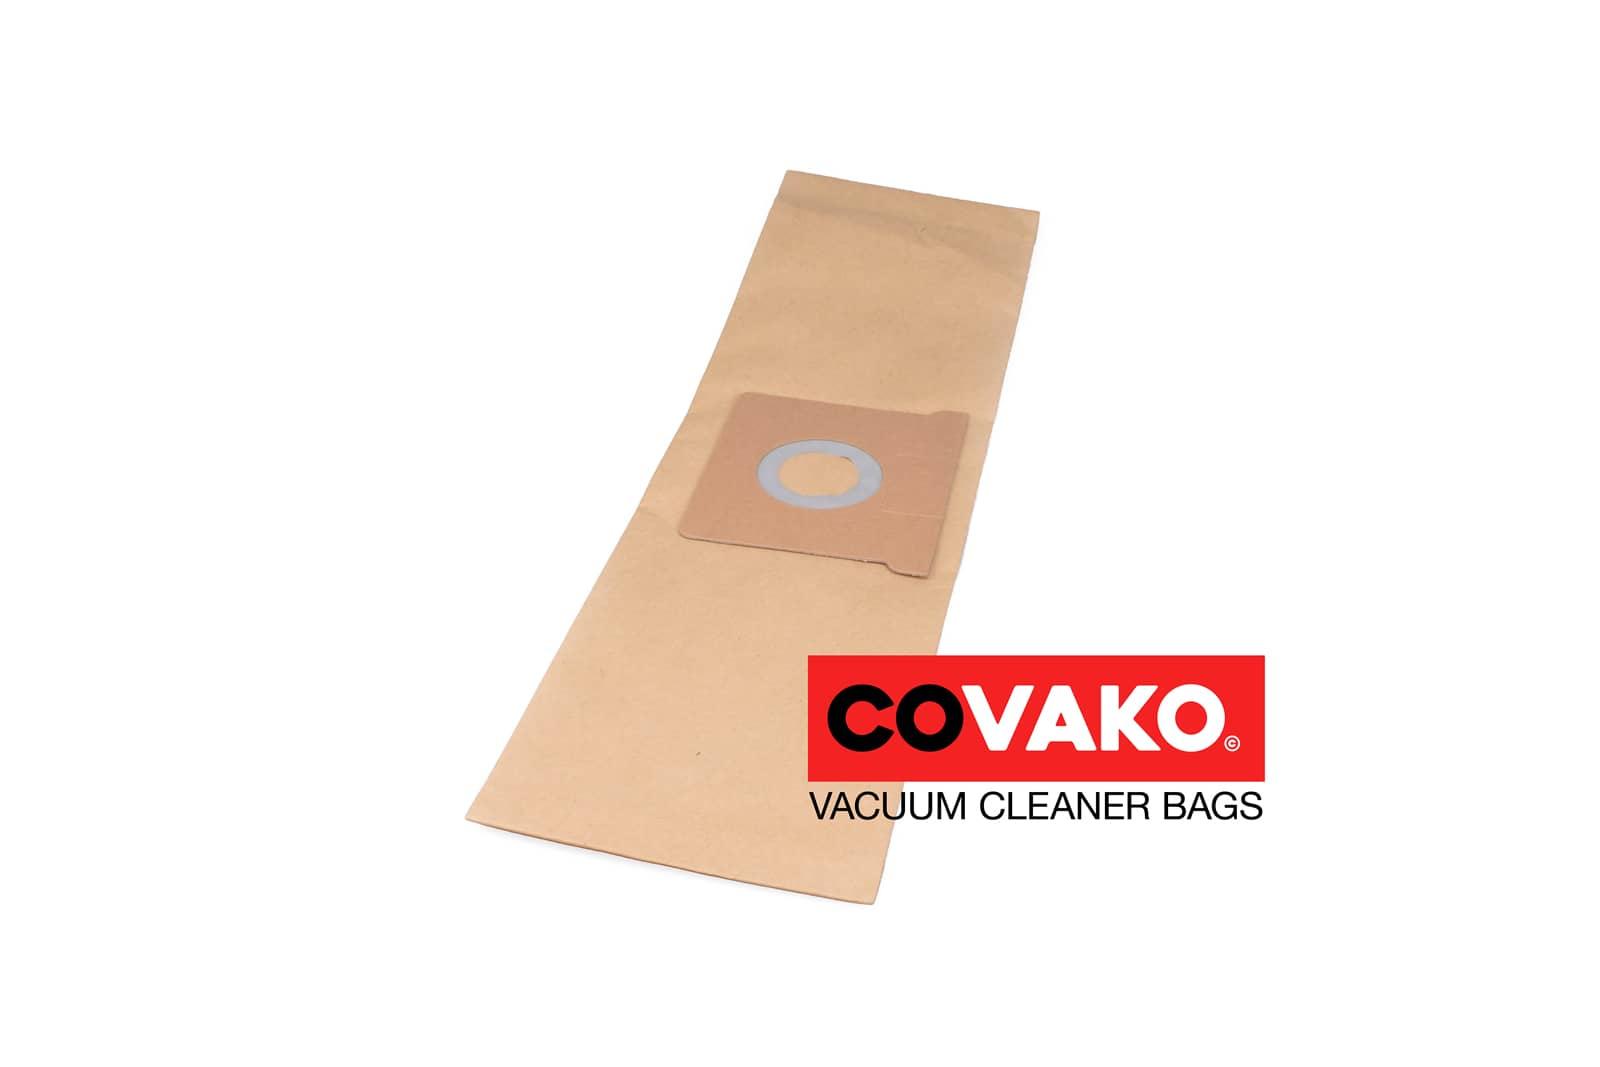 Sorma SM 505 / Papier - Sorma sacs d'aspirateur